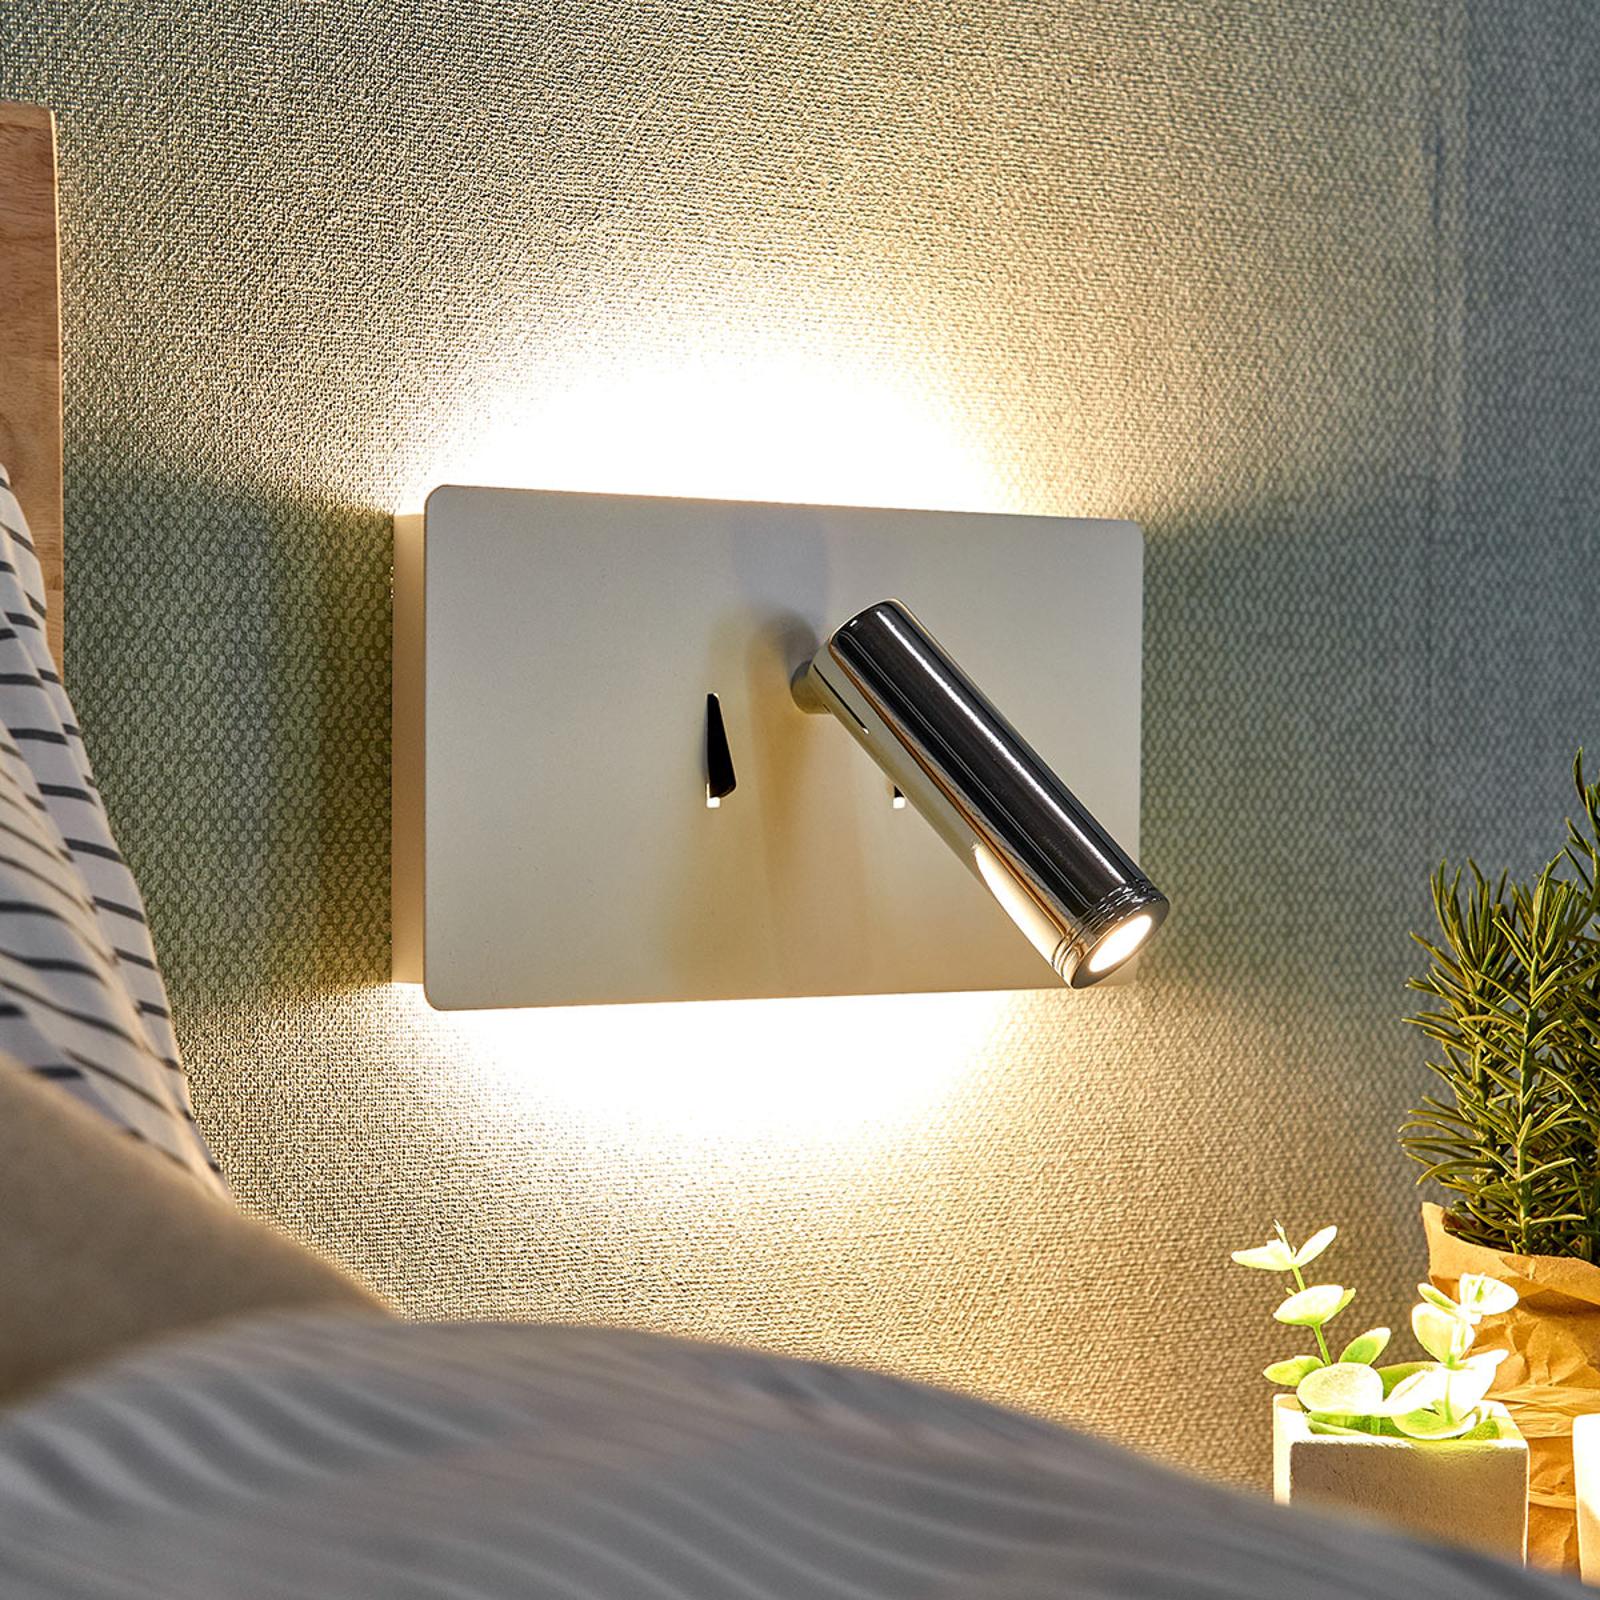 LED-vegglampe Elske med leselys